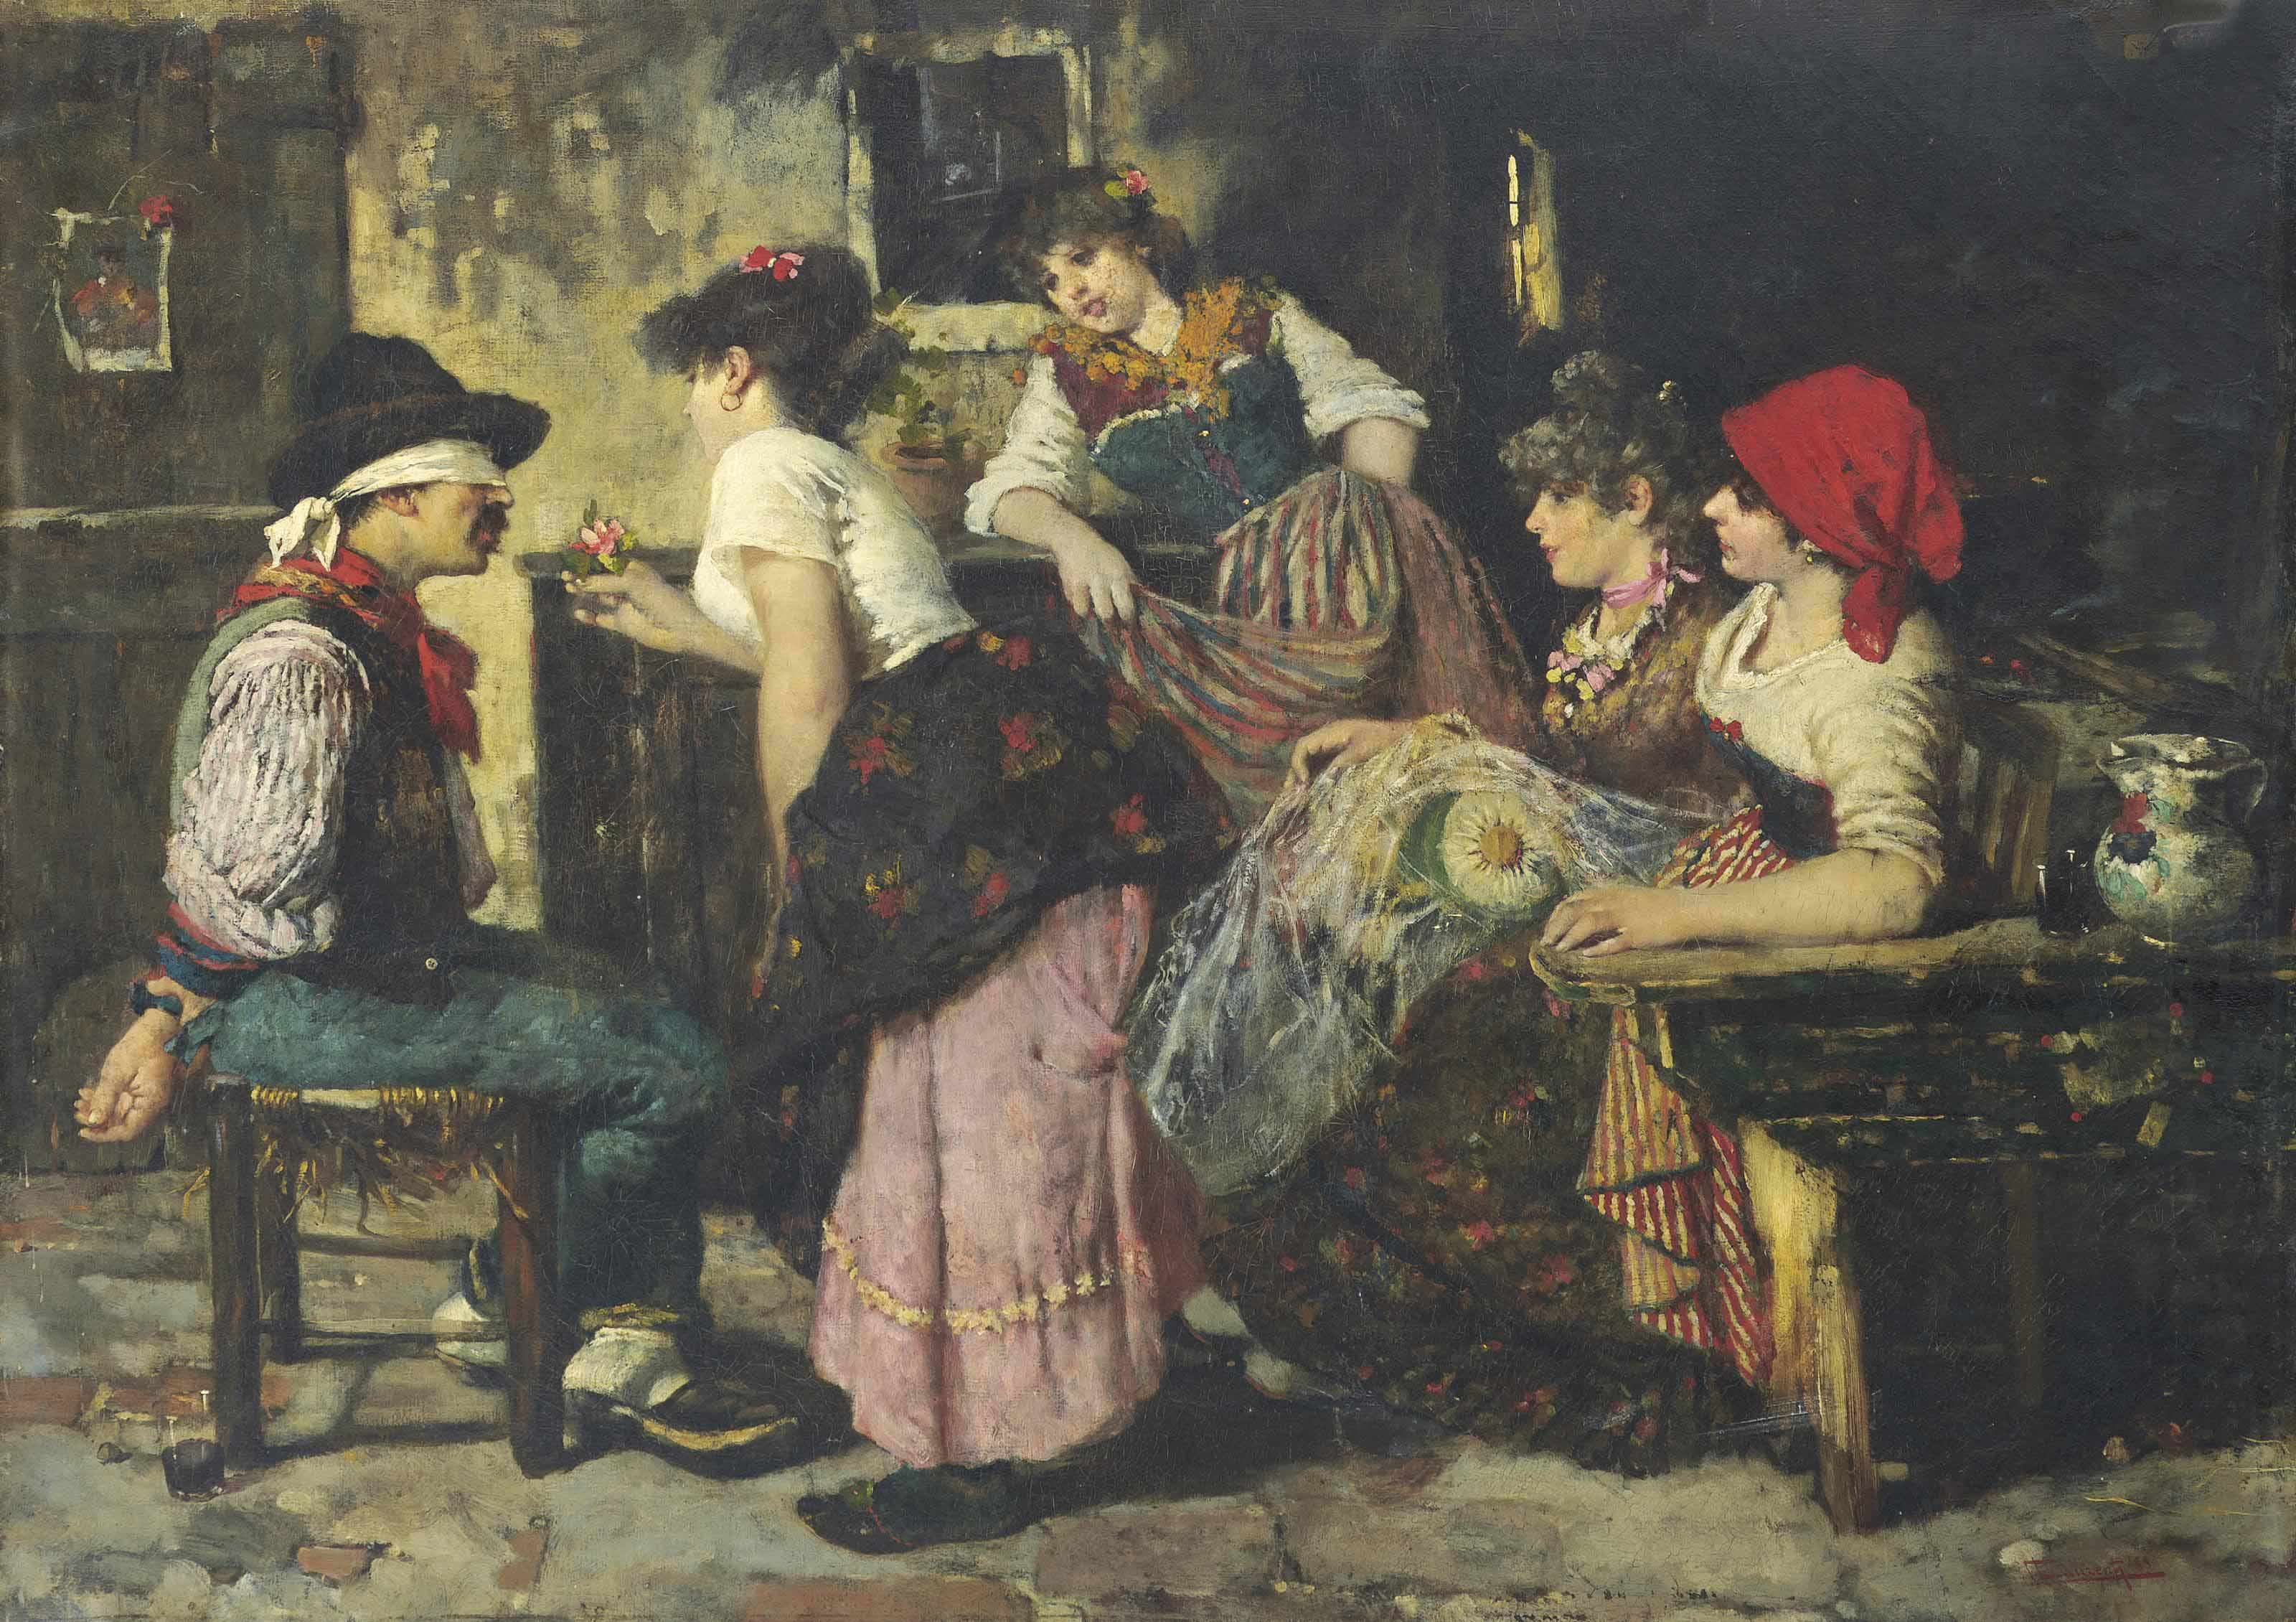 C. Lanzenti (Italian, 19th Century)